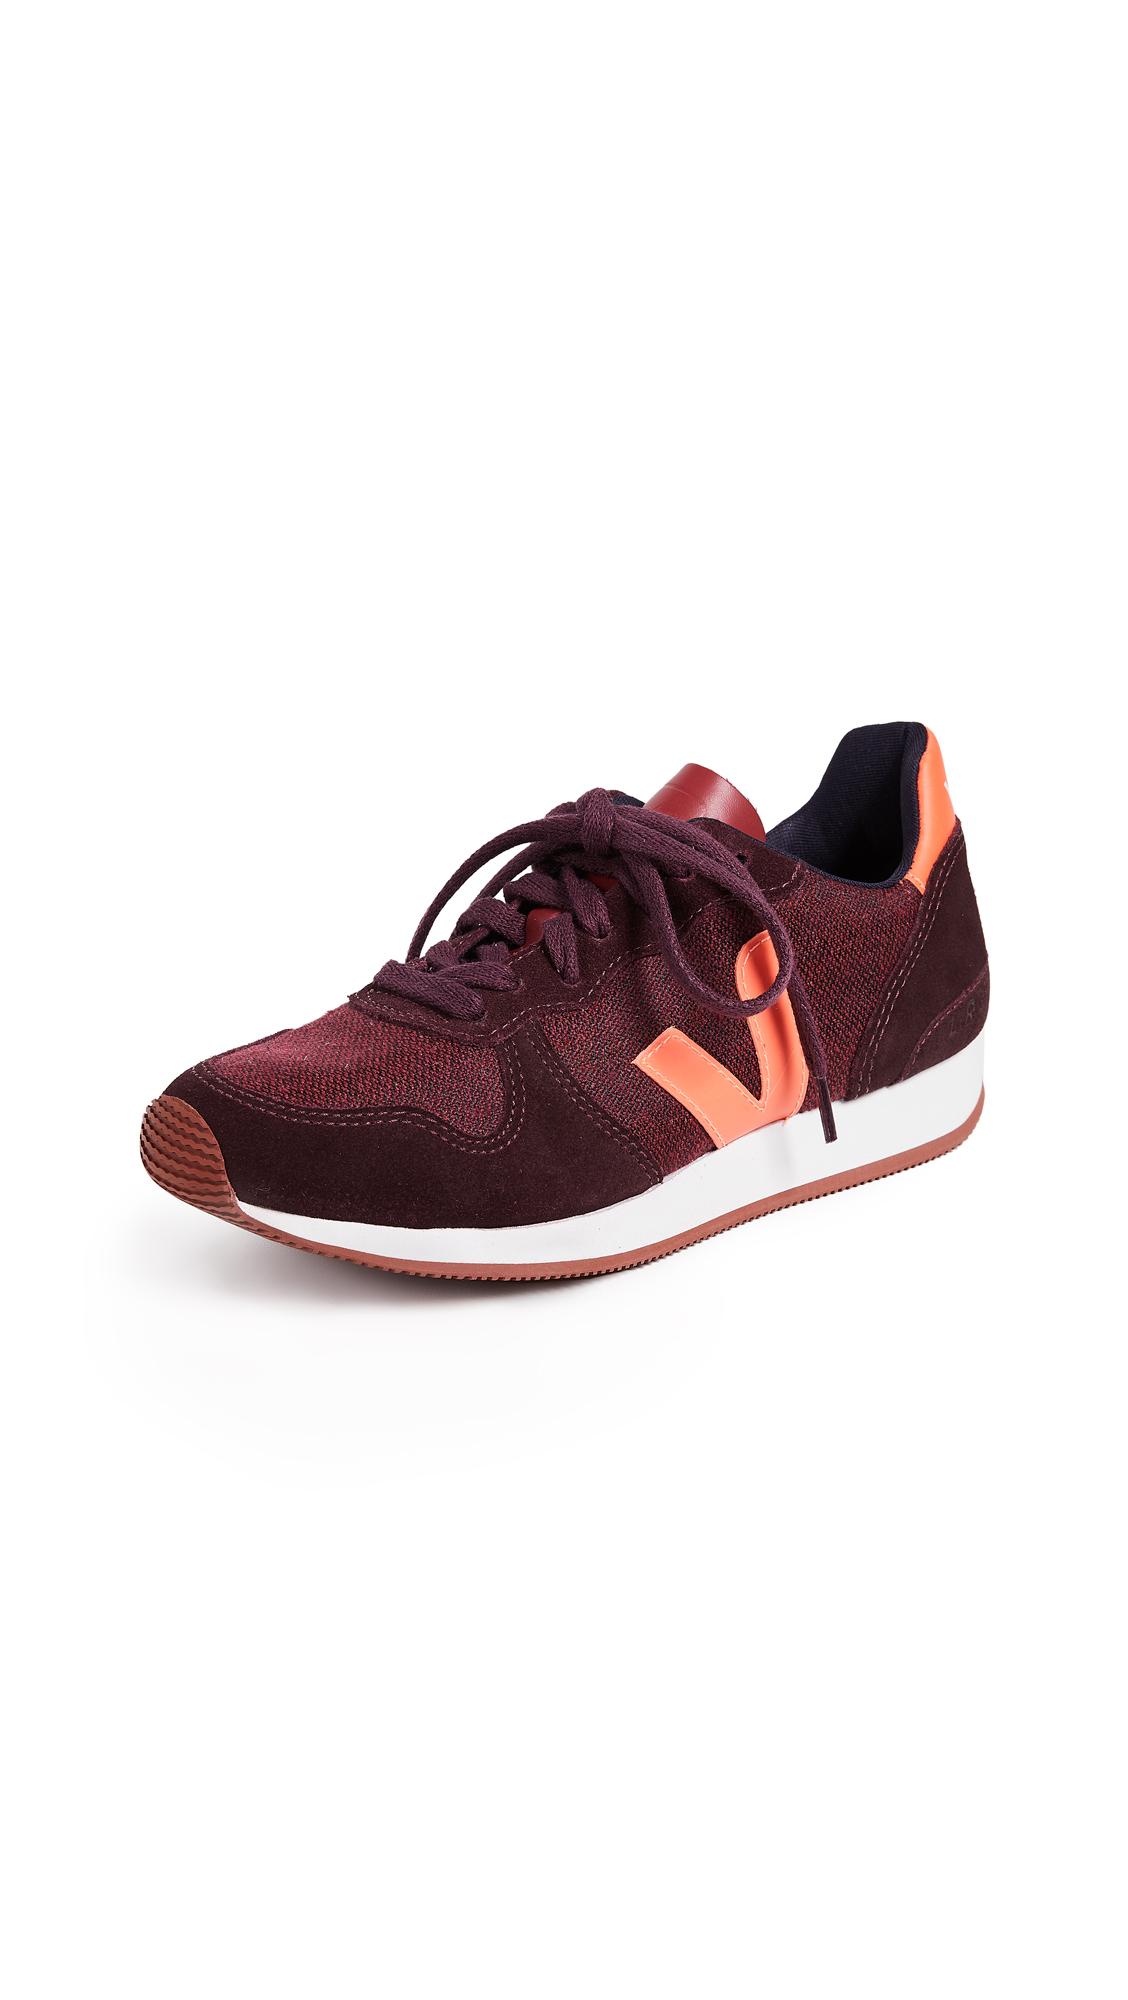 Veja Holiday Sneakers - Pixel/Burgundy/Orange Fluo